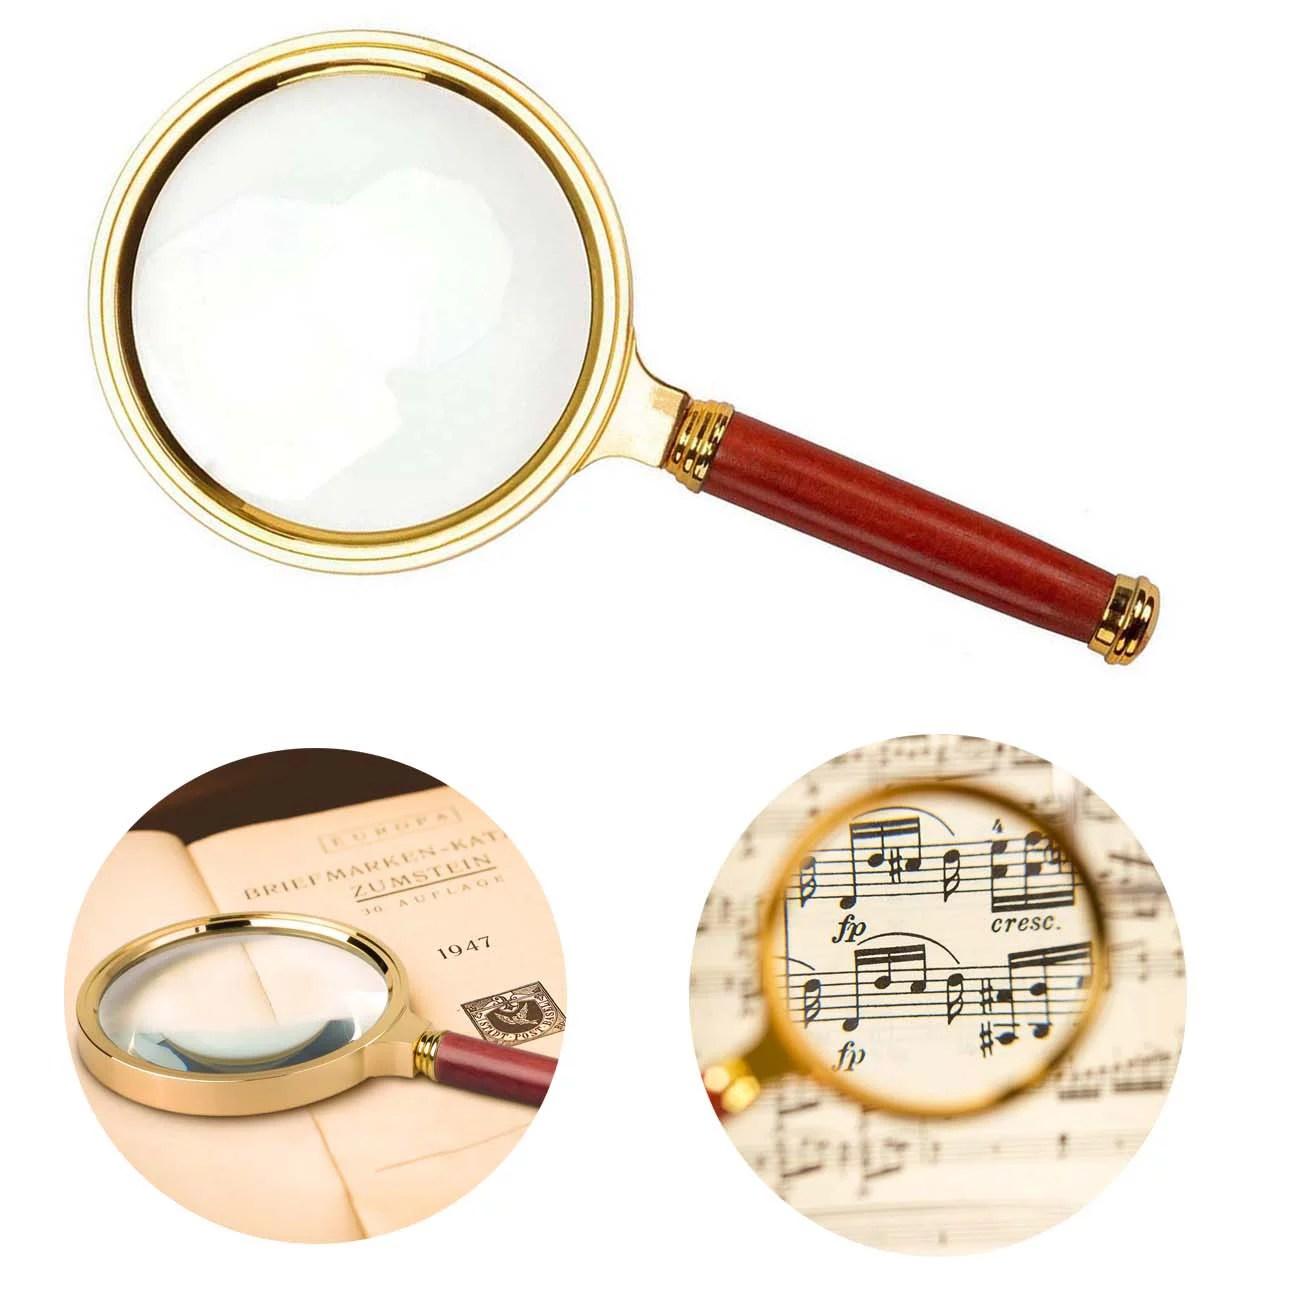 Peroptimist Handheld Magnifier With Rosewood Handle